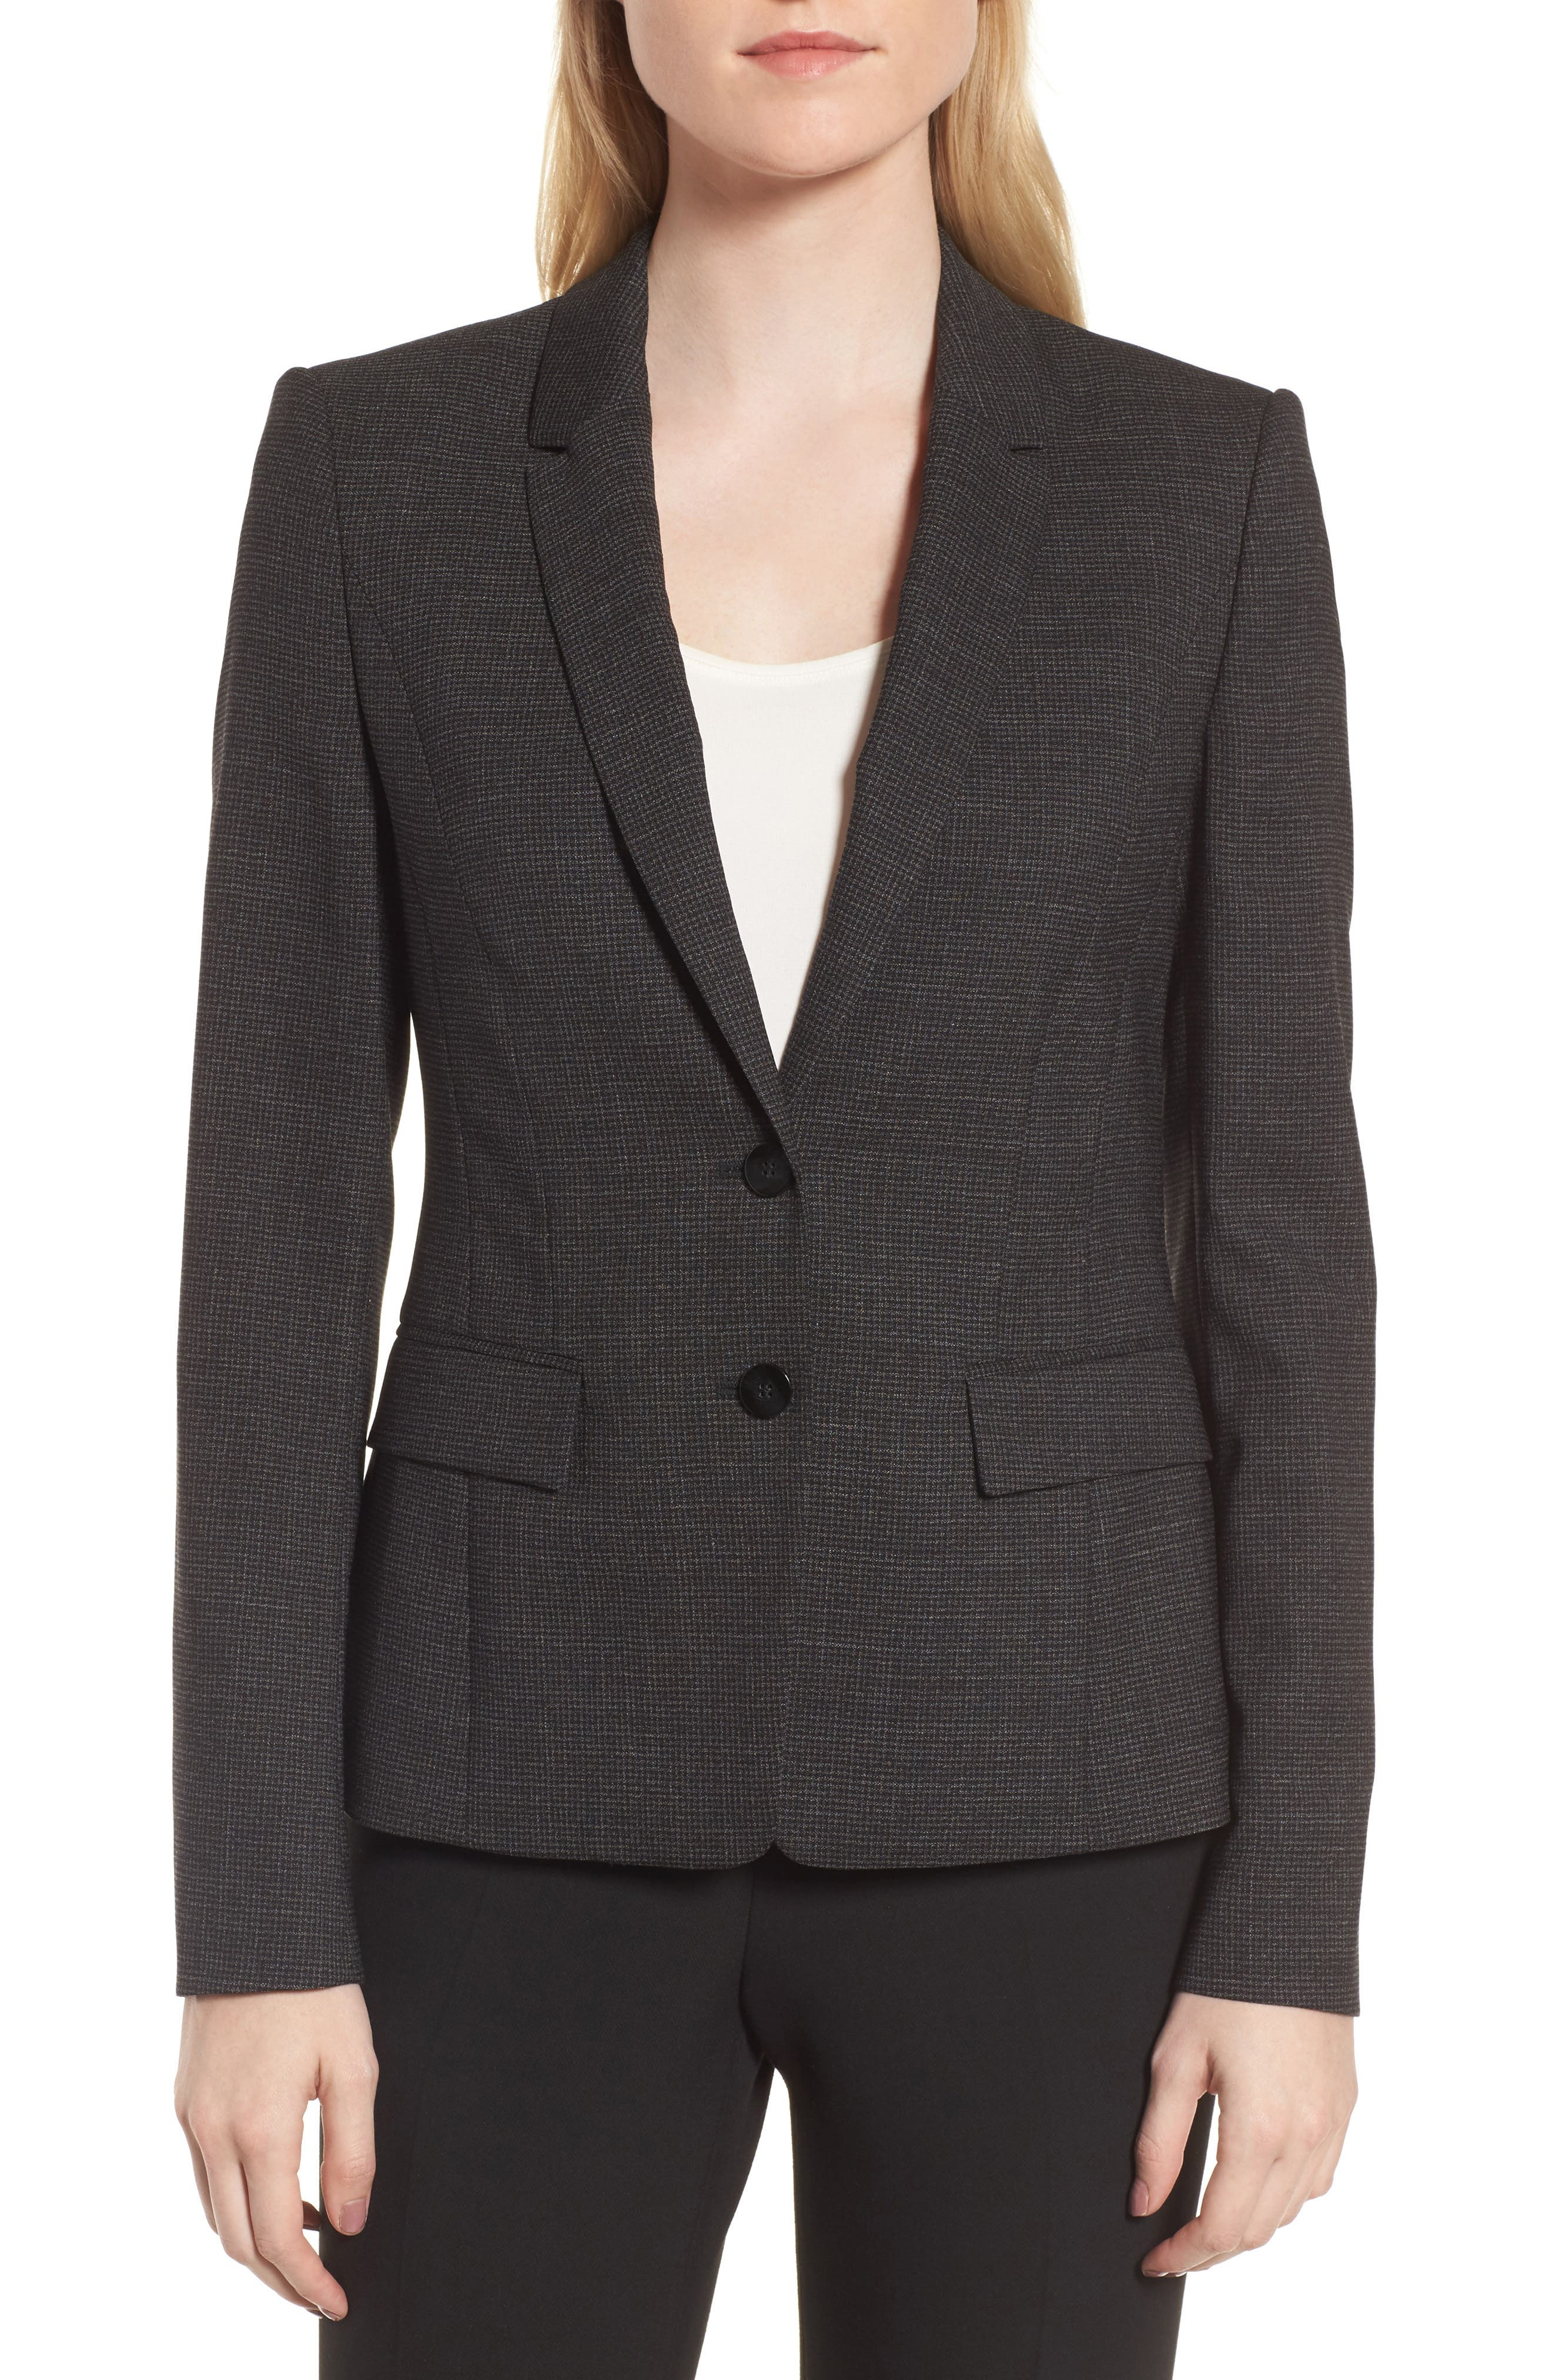 Jewisa Wool Jacket,                         Main,                         color, 006